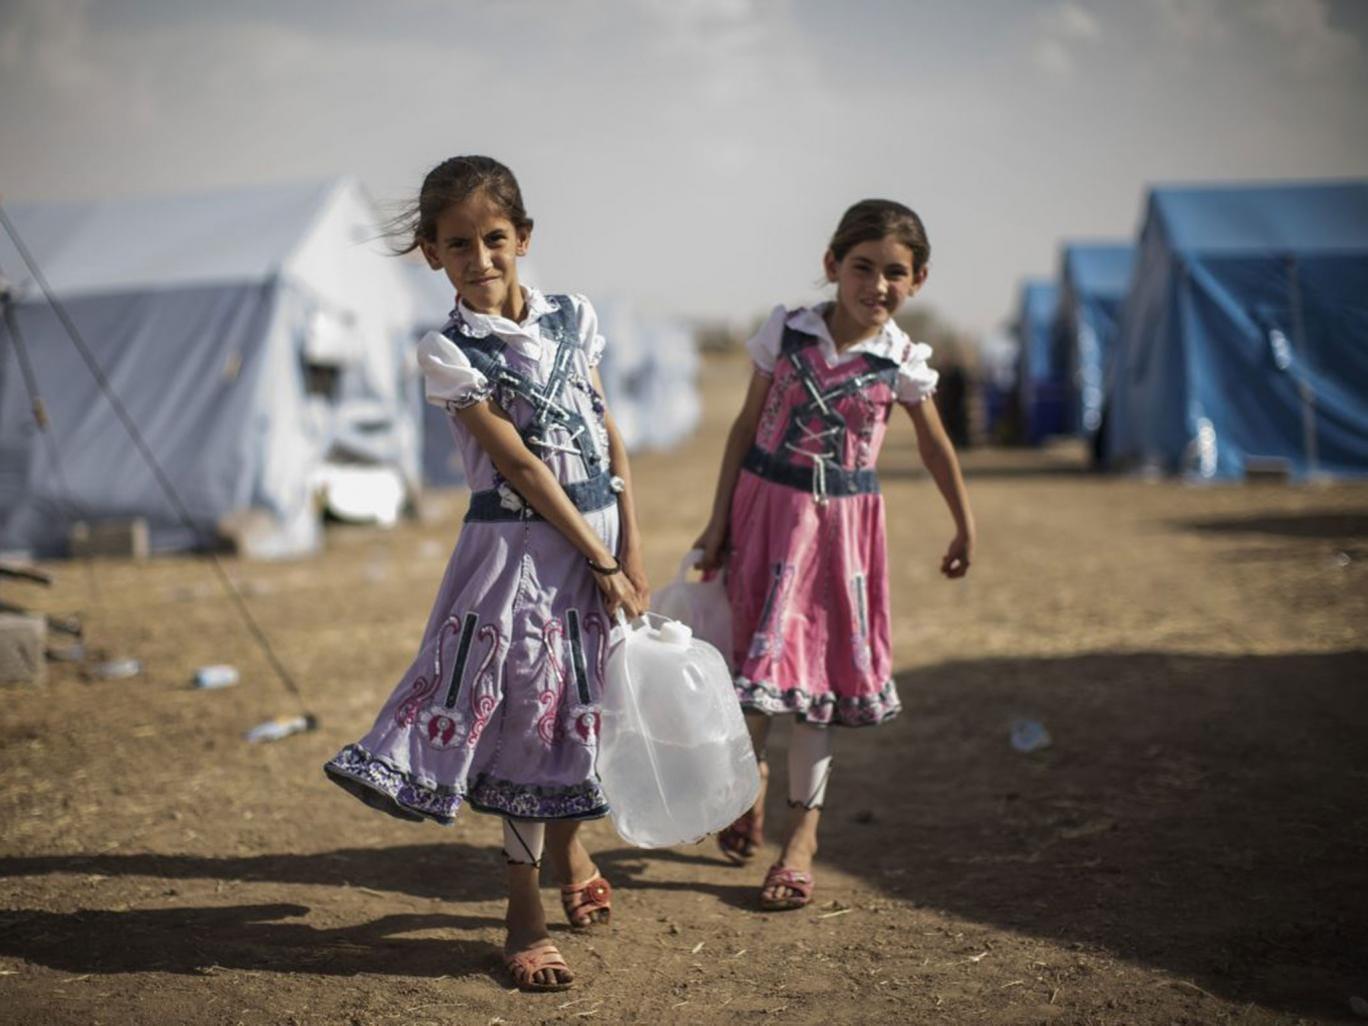 Two Iraqi girls in a temporary camp near the Kurdish region on Friday